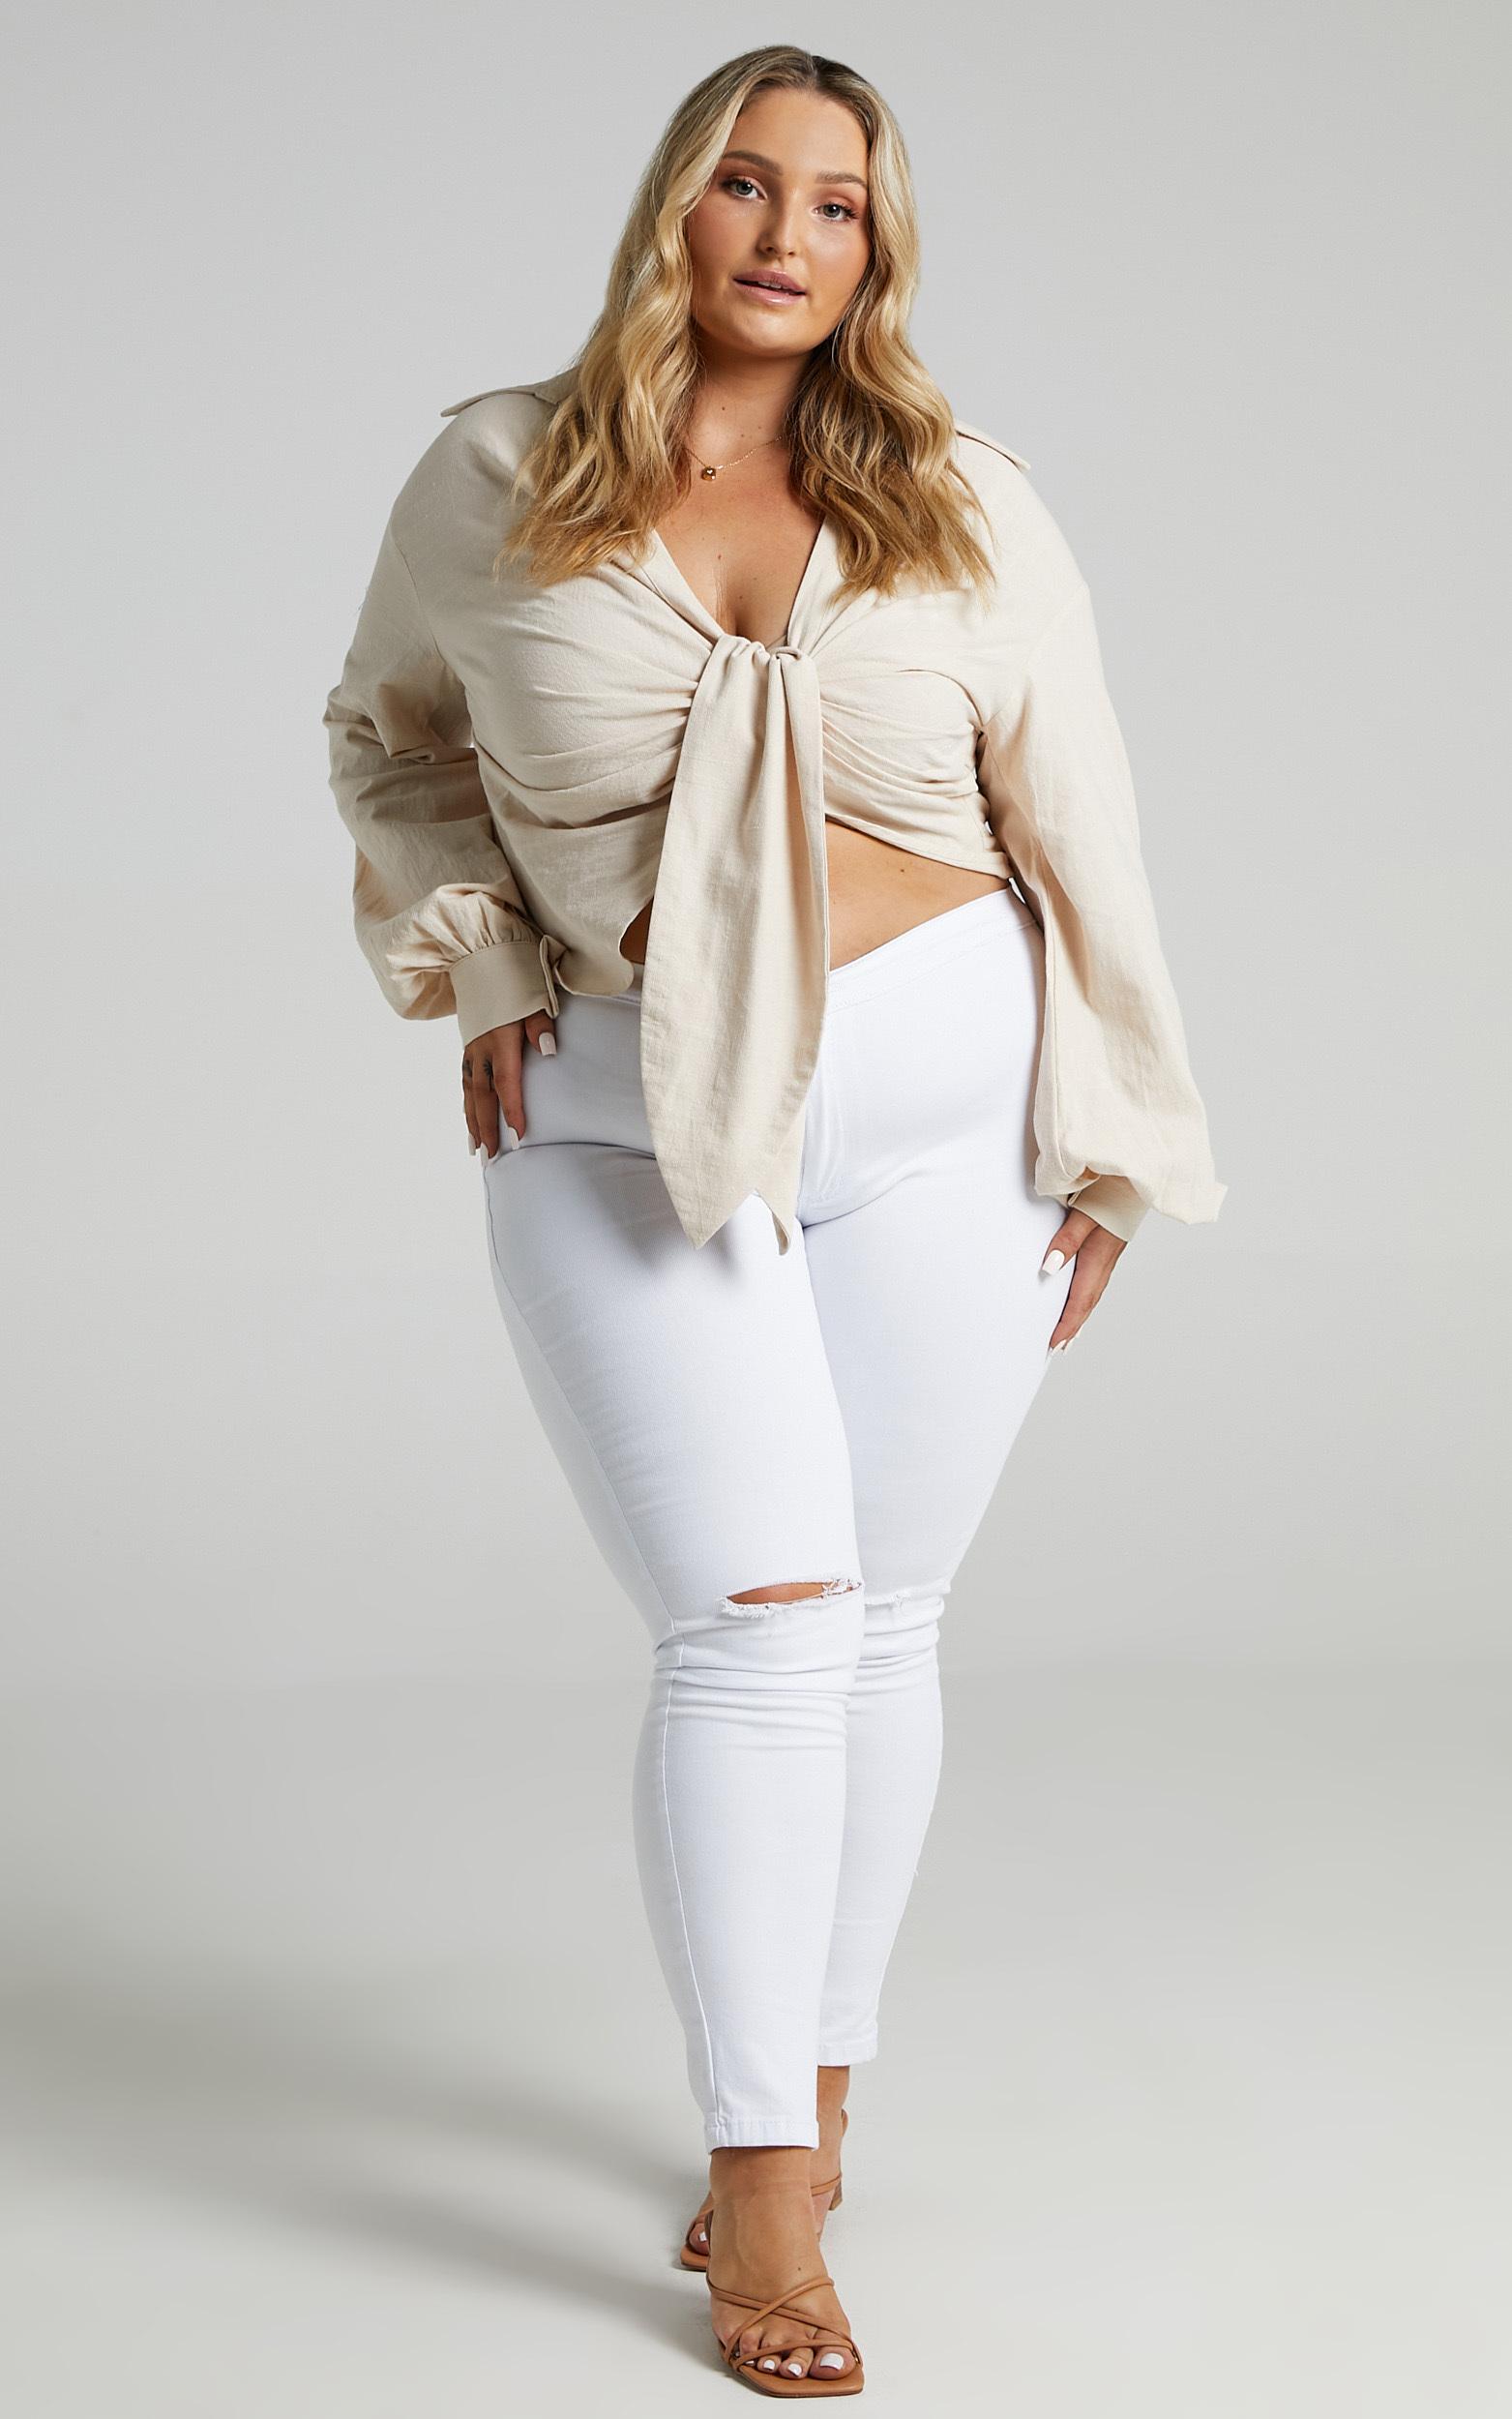 Hanes Longsleeve Drape Shirt in Cream - 04, CRE4, hi-res image number null